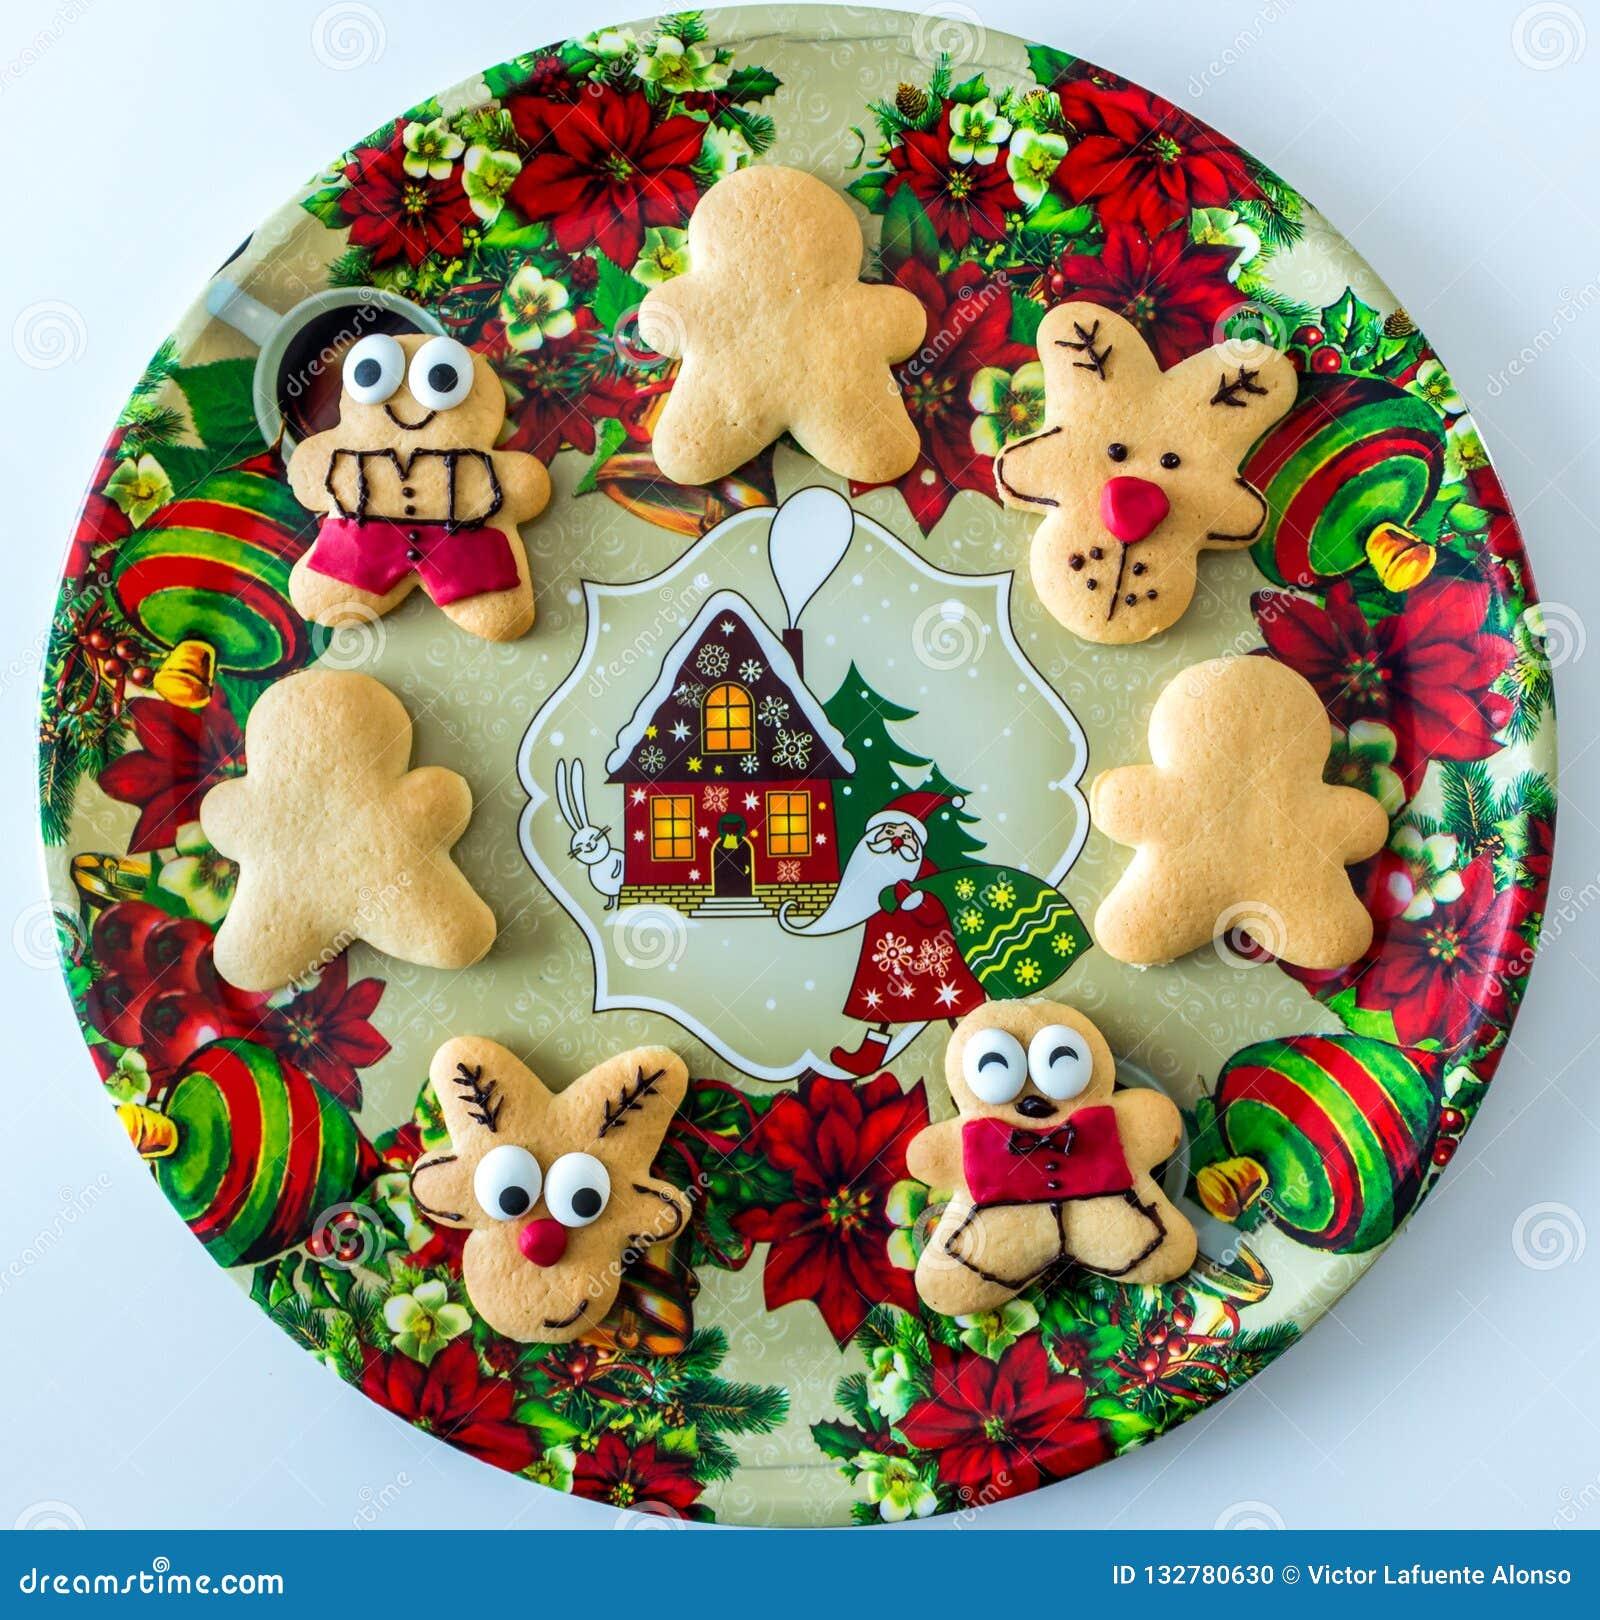 Handmade Christmas Cookies On Decorative Tray Stock Photo Image Of